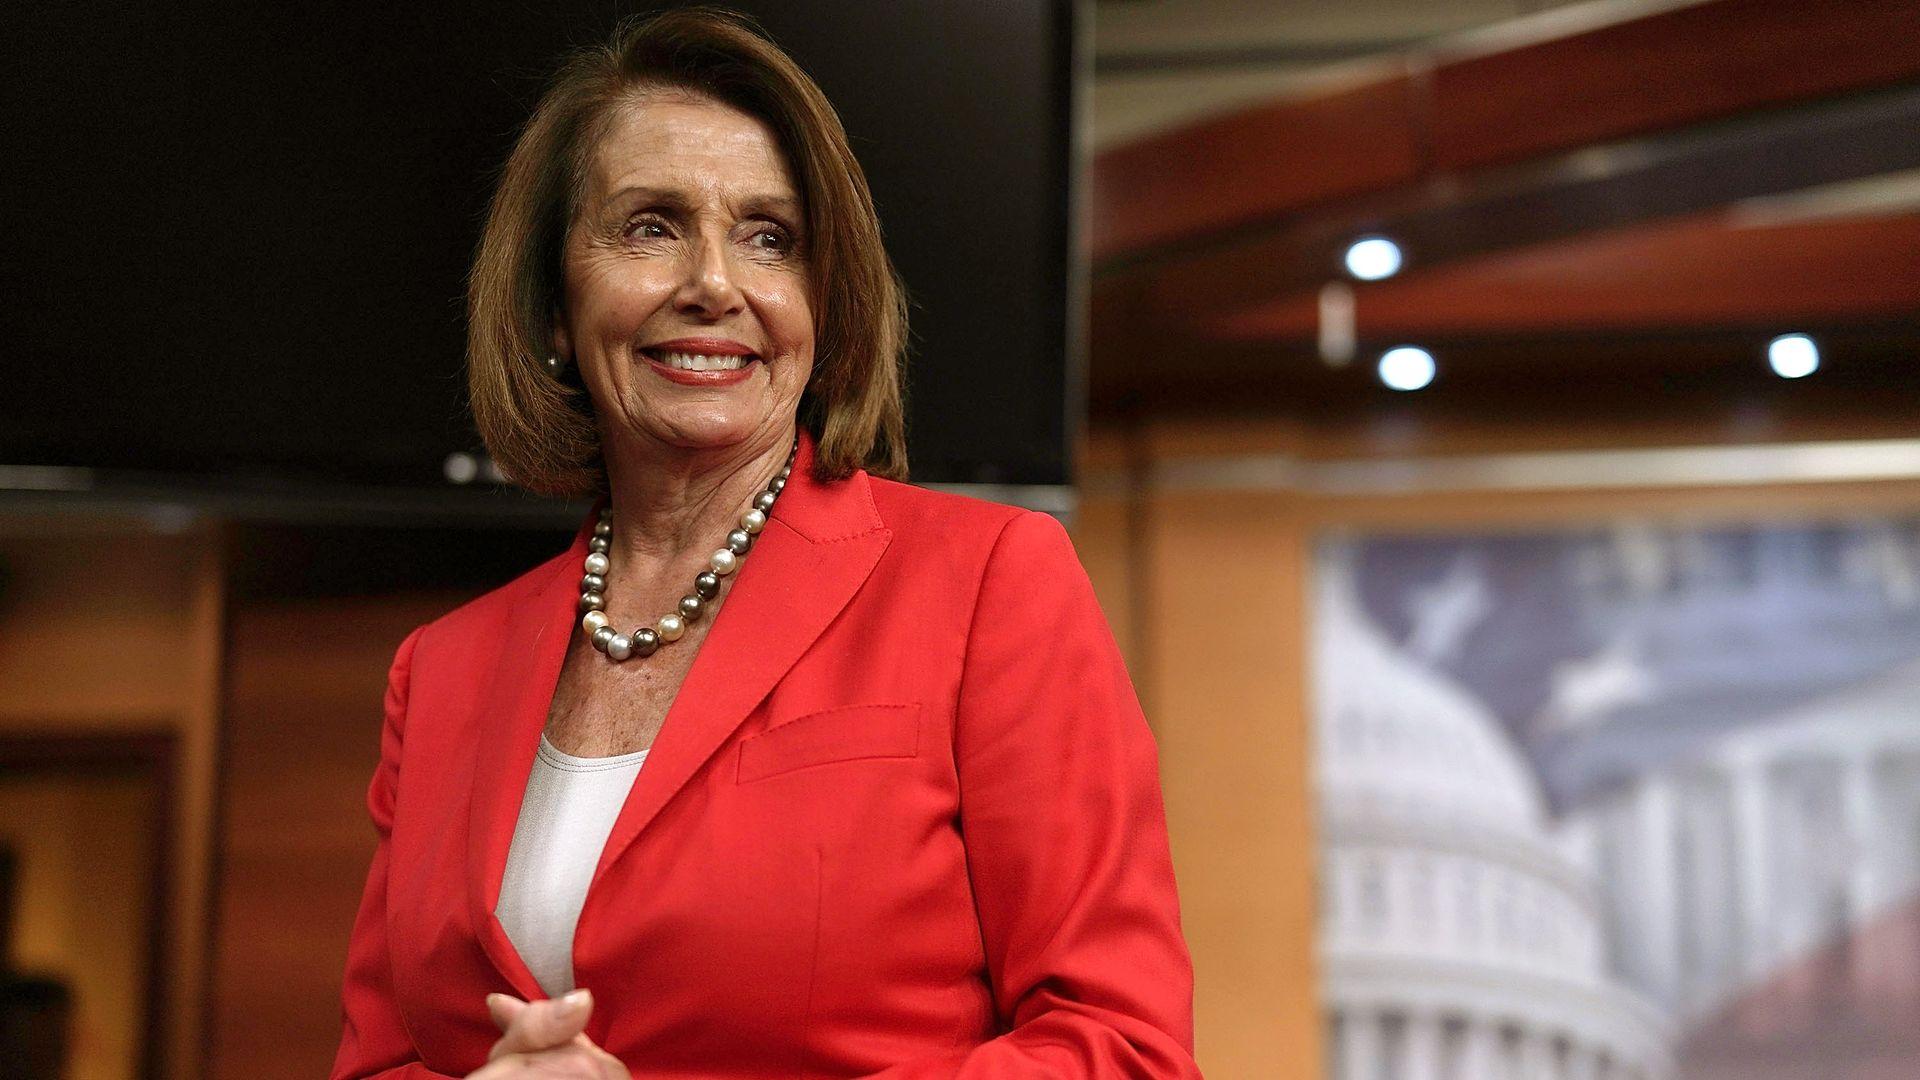 Nancy Pelosi wearing a red pantsuit